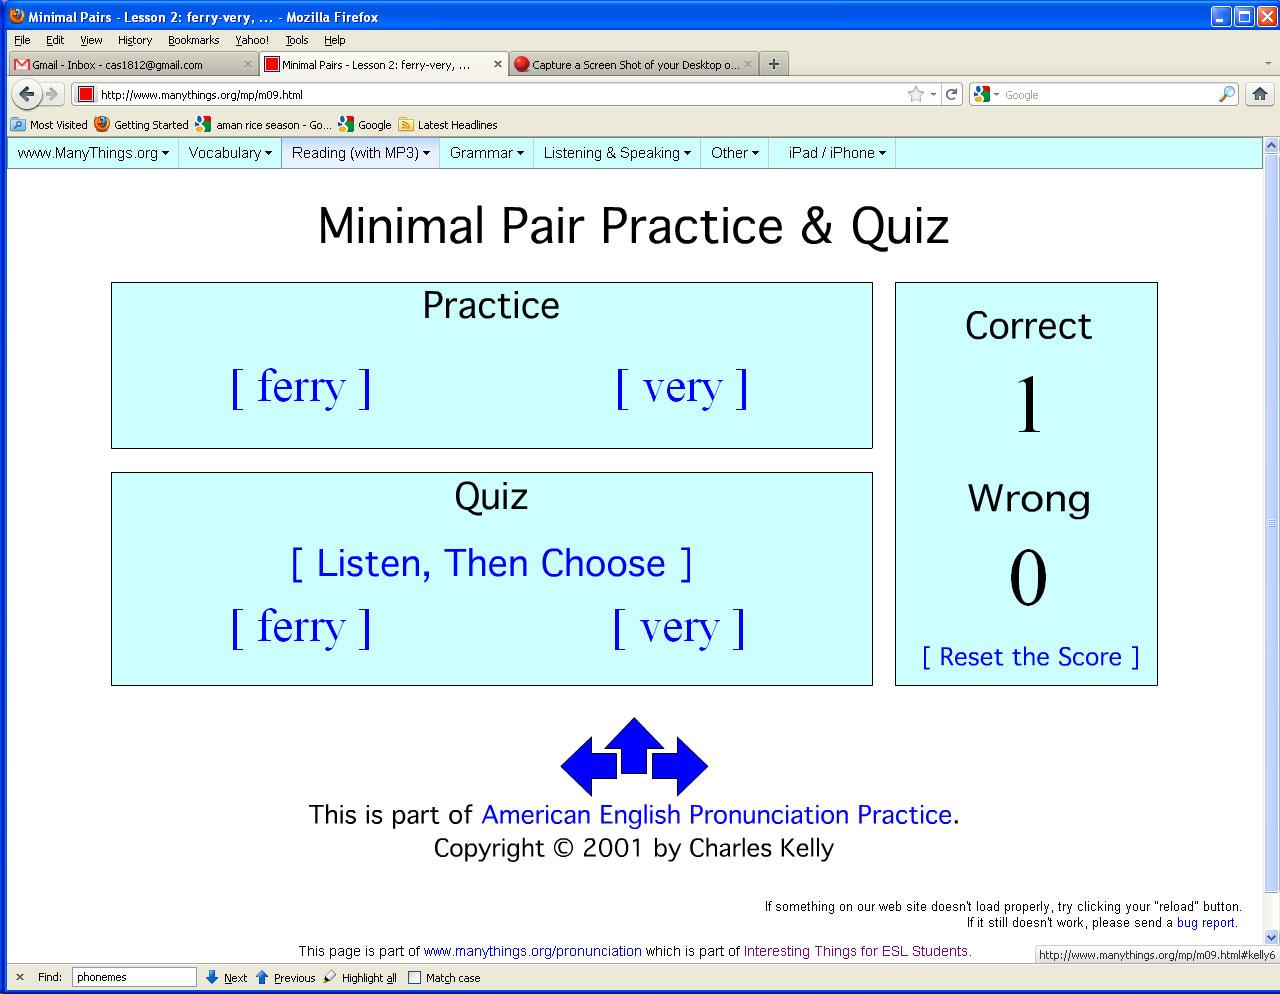 Pronunciation Practice Students Want More